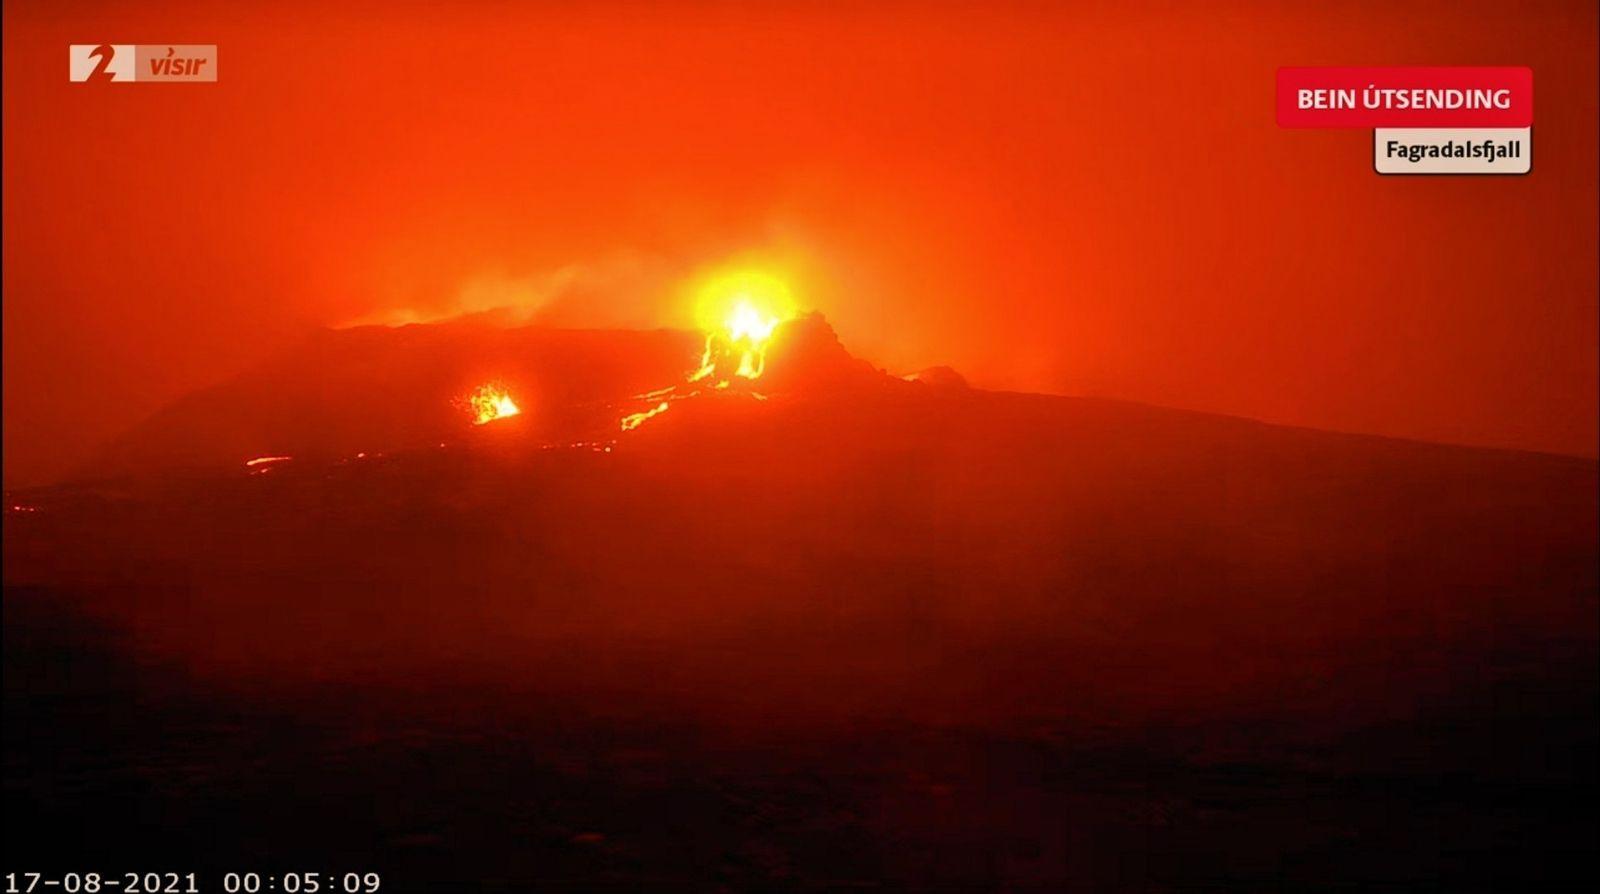 Fagradalsfjall - the night was hot - Visir webcam 08/17/2021 / 12:05 am